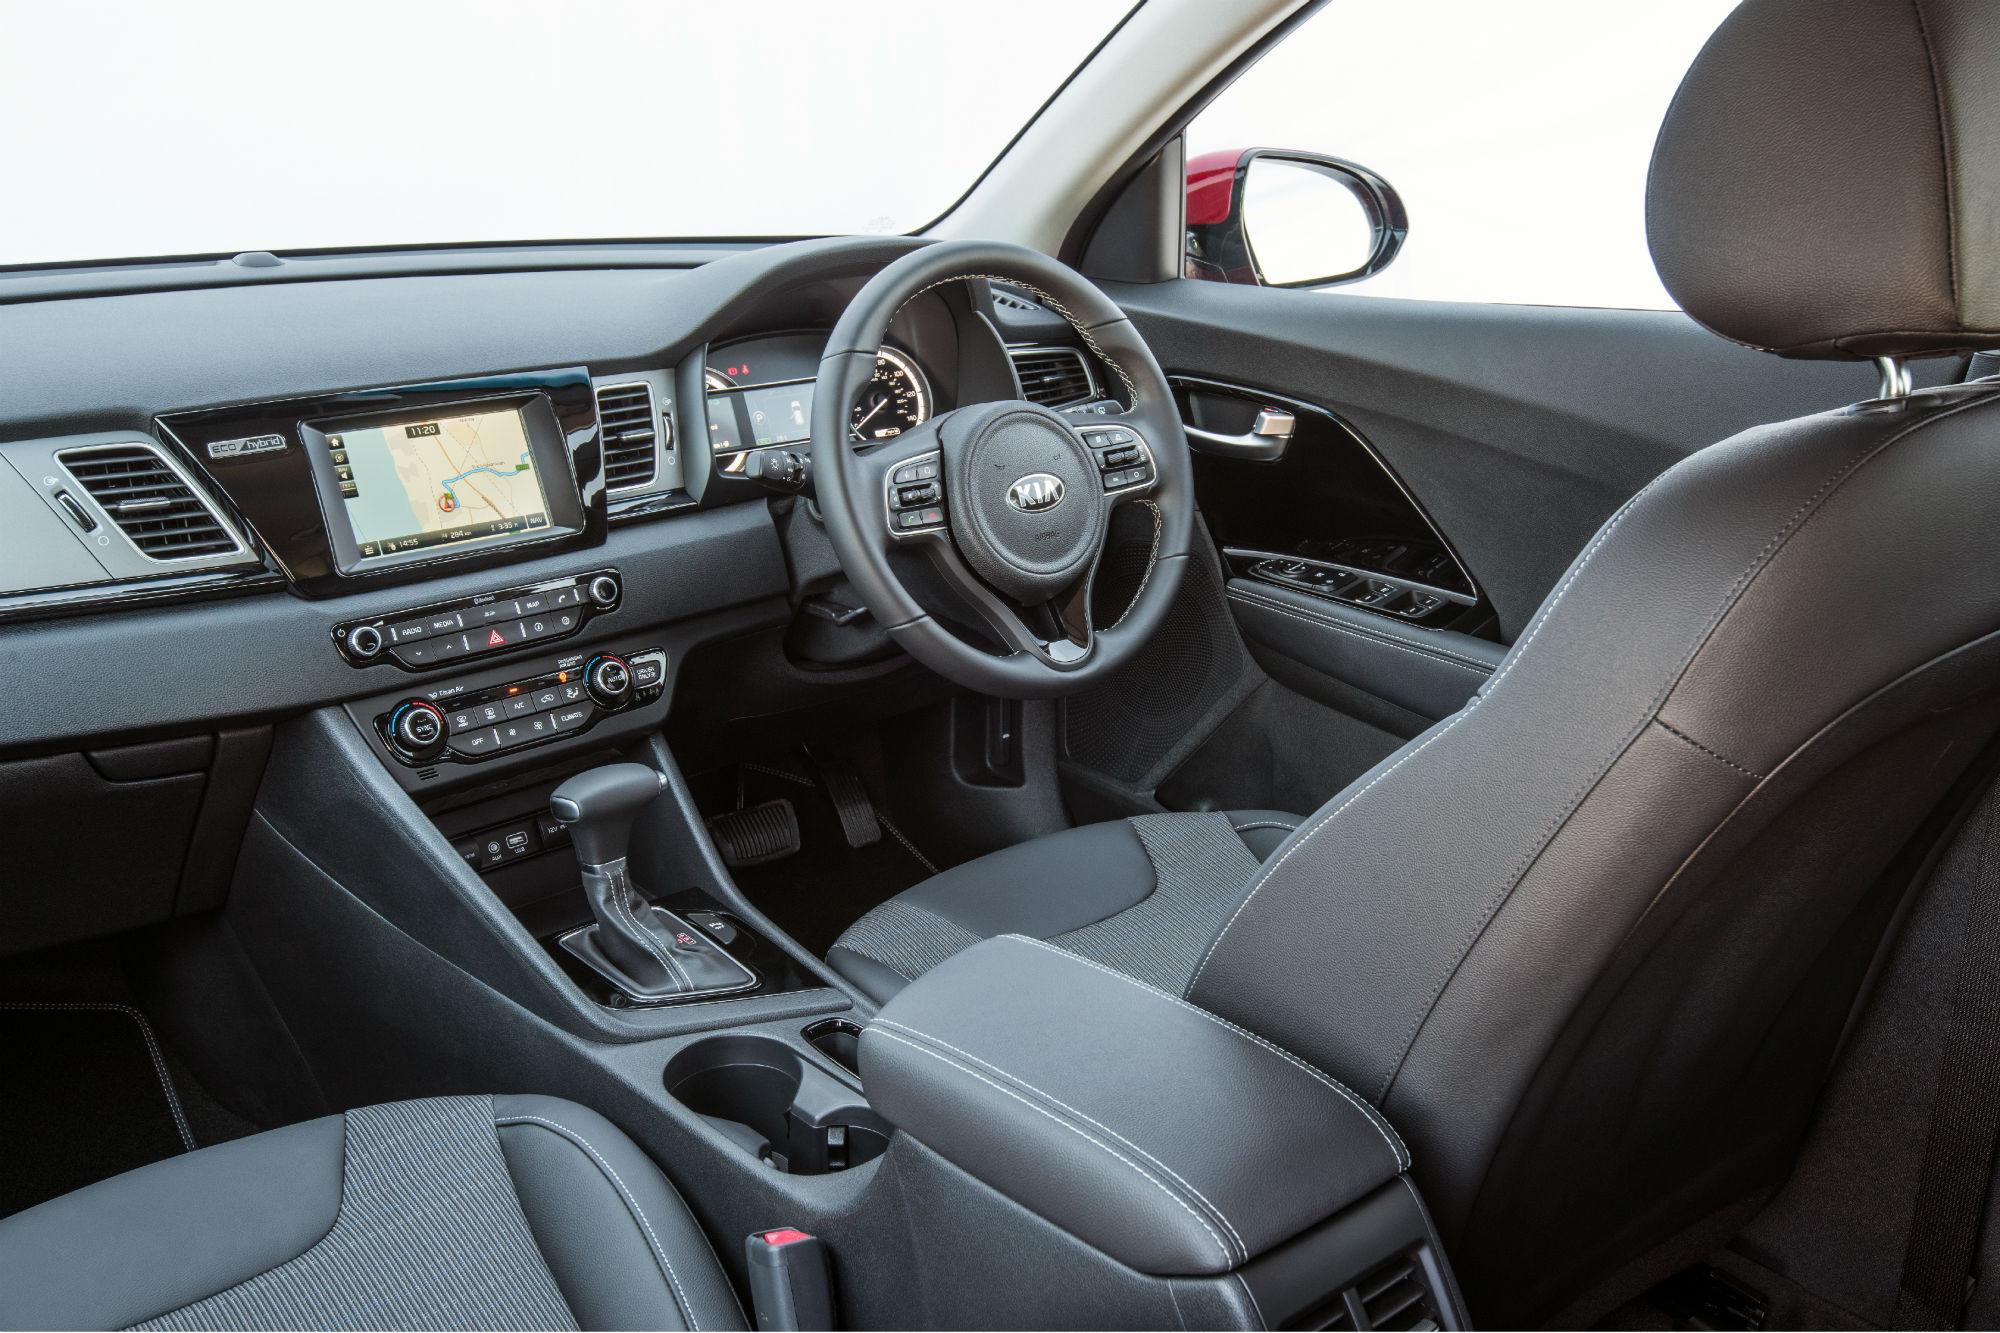 Kia niro 1 6 litre gdi 2 crossover review car keys for Interior kia niro